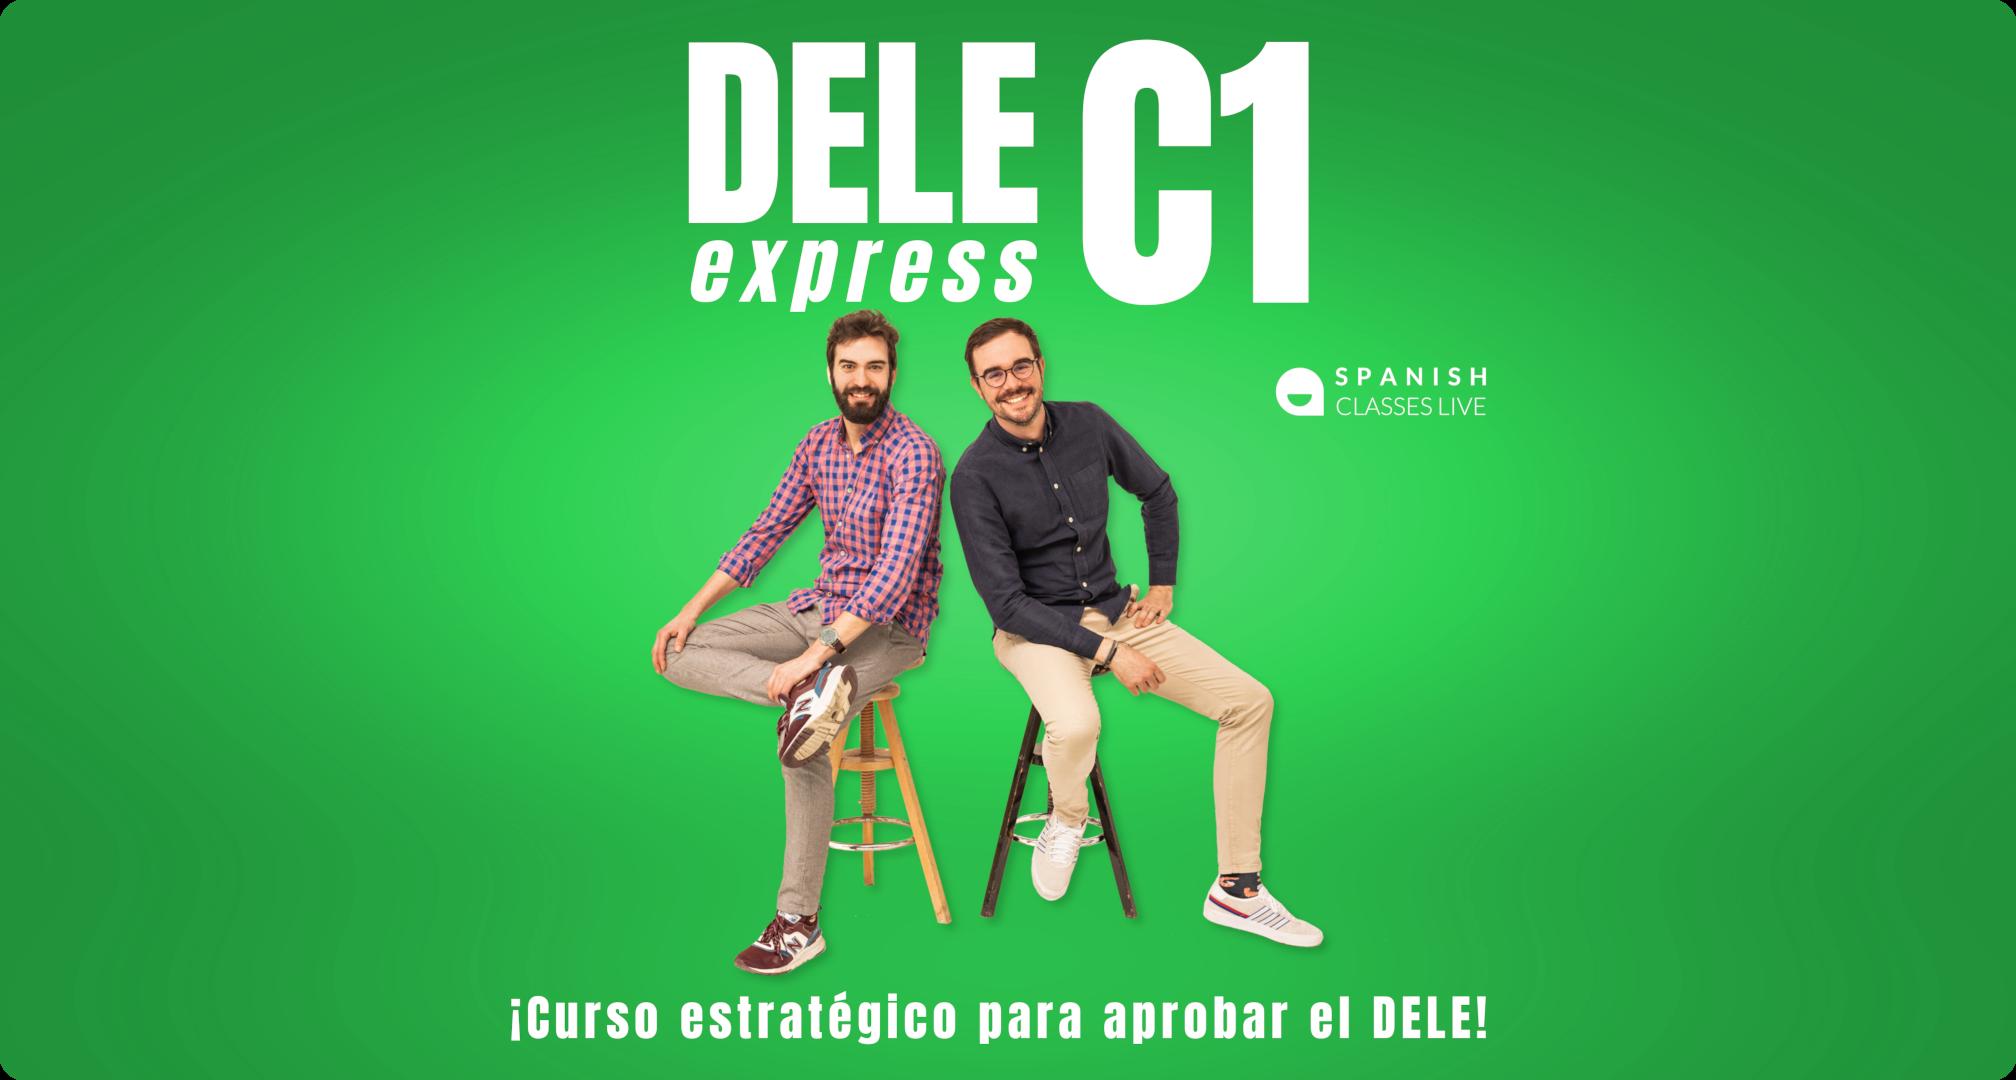 DELE express C1